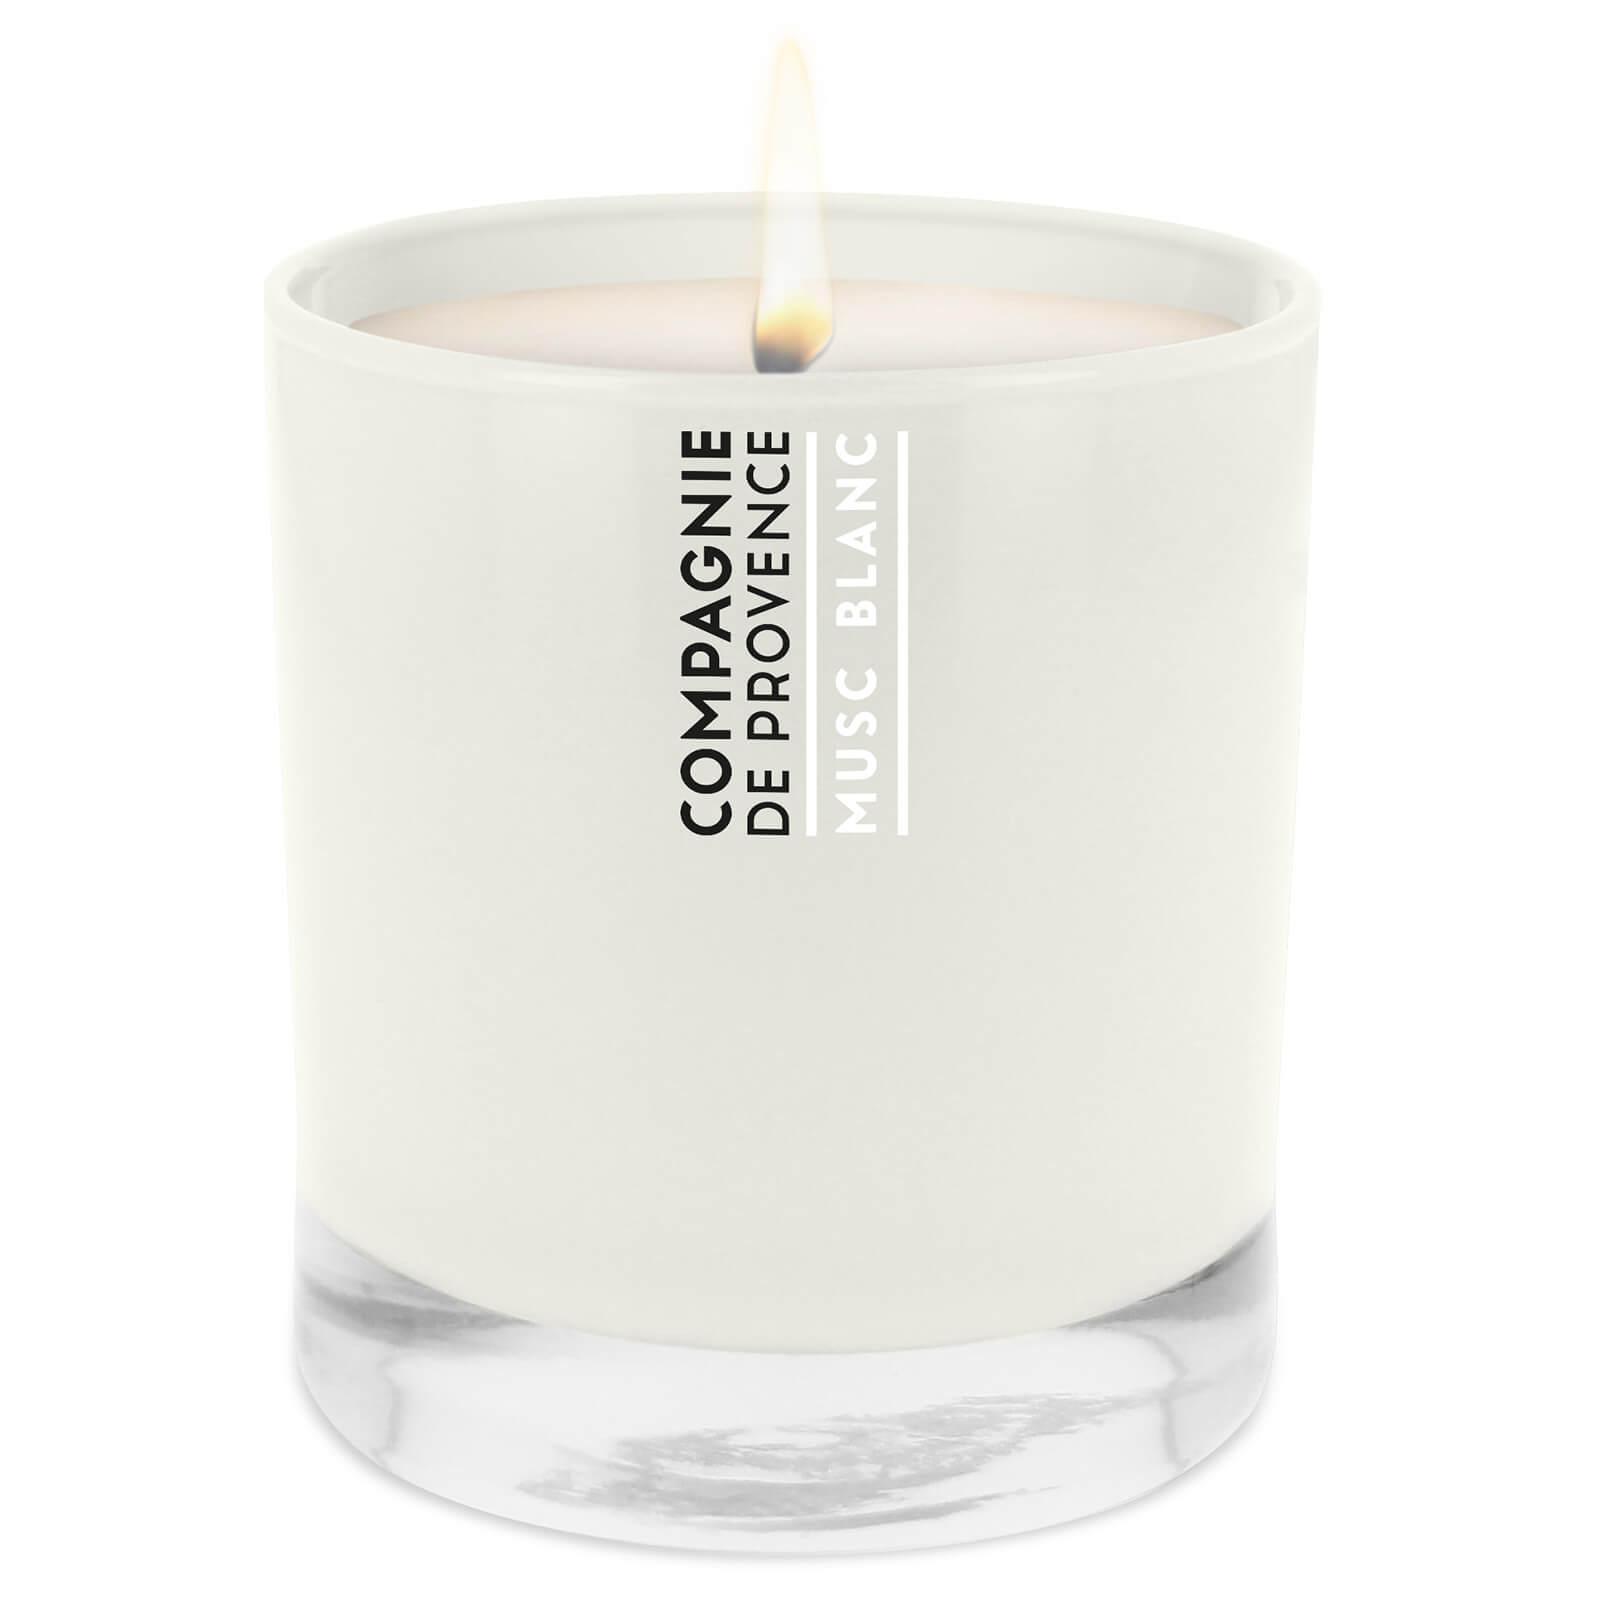 Купить Парфюмированная свеча Compagnie de Provence White Musk Scented Candle 260 г